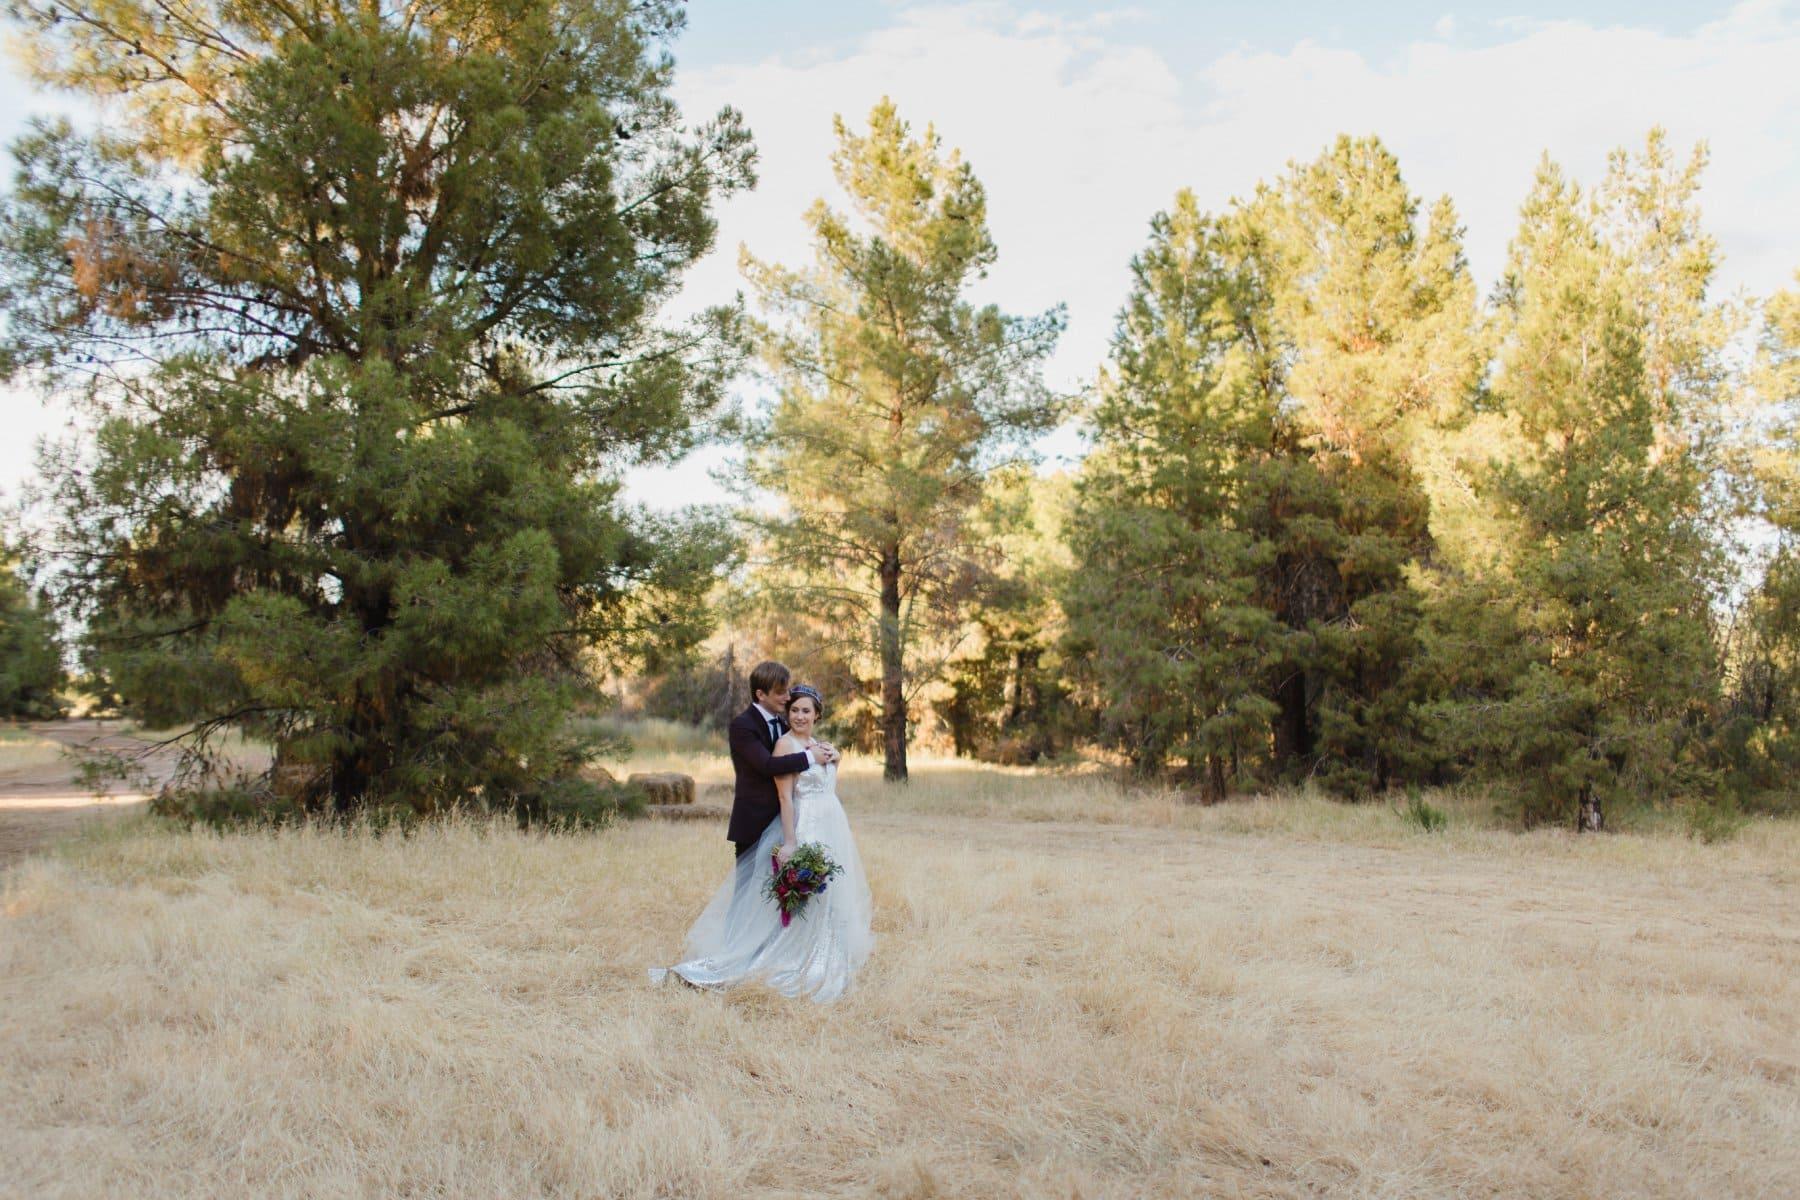 Schnepf Farms the Meadow forest wedding venue in Phoenix